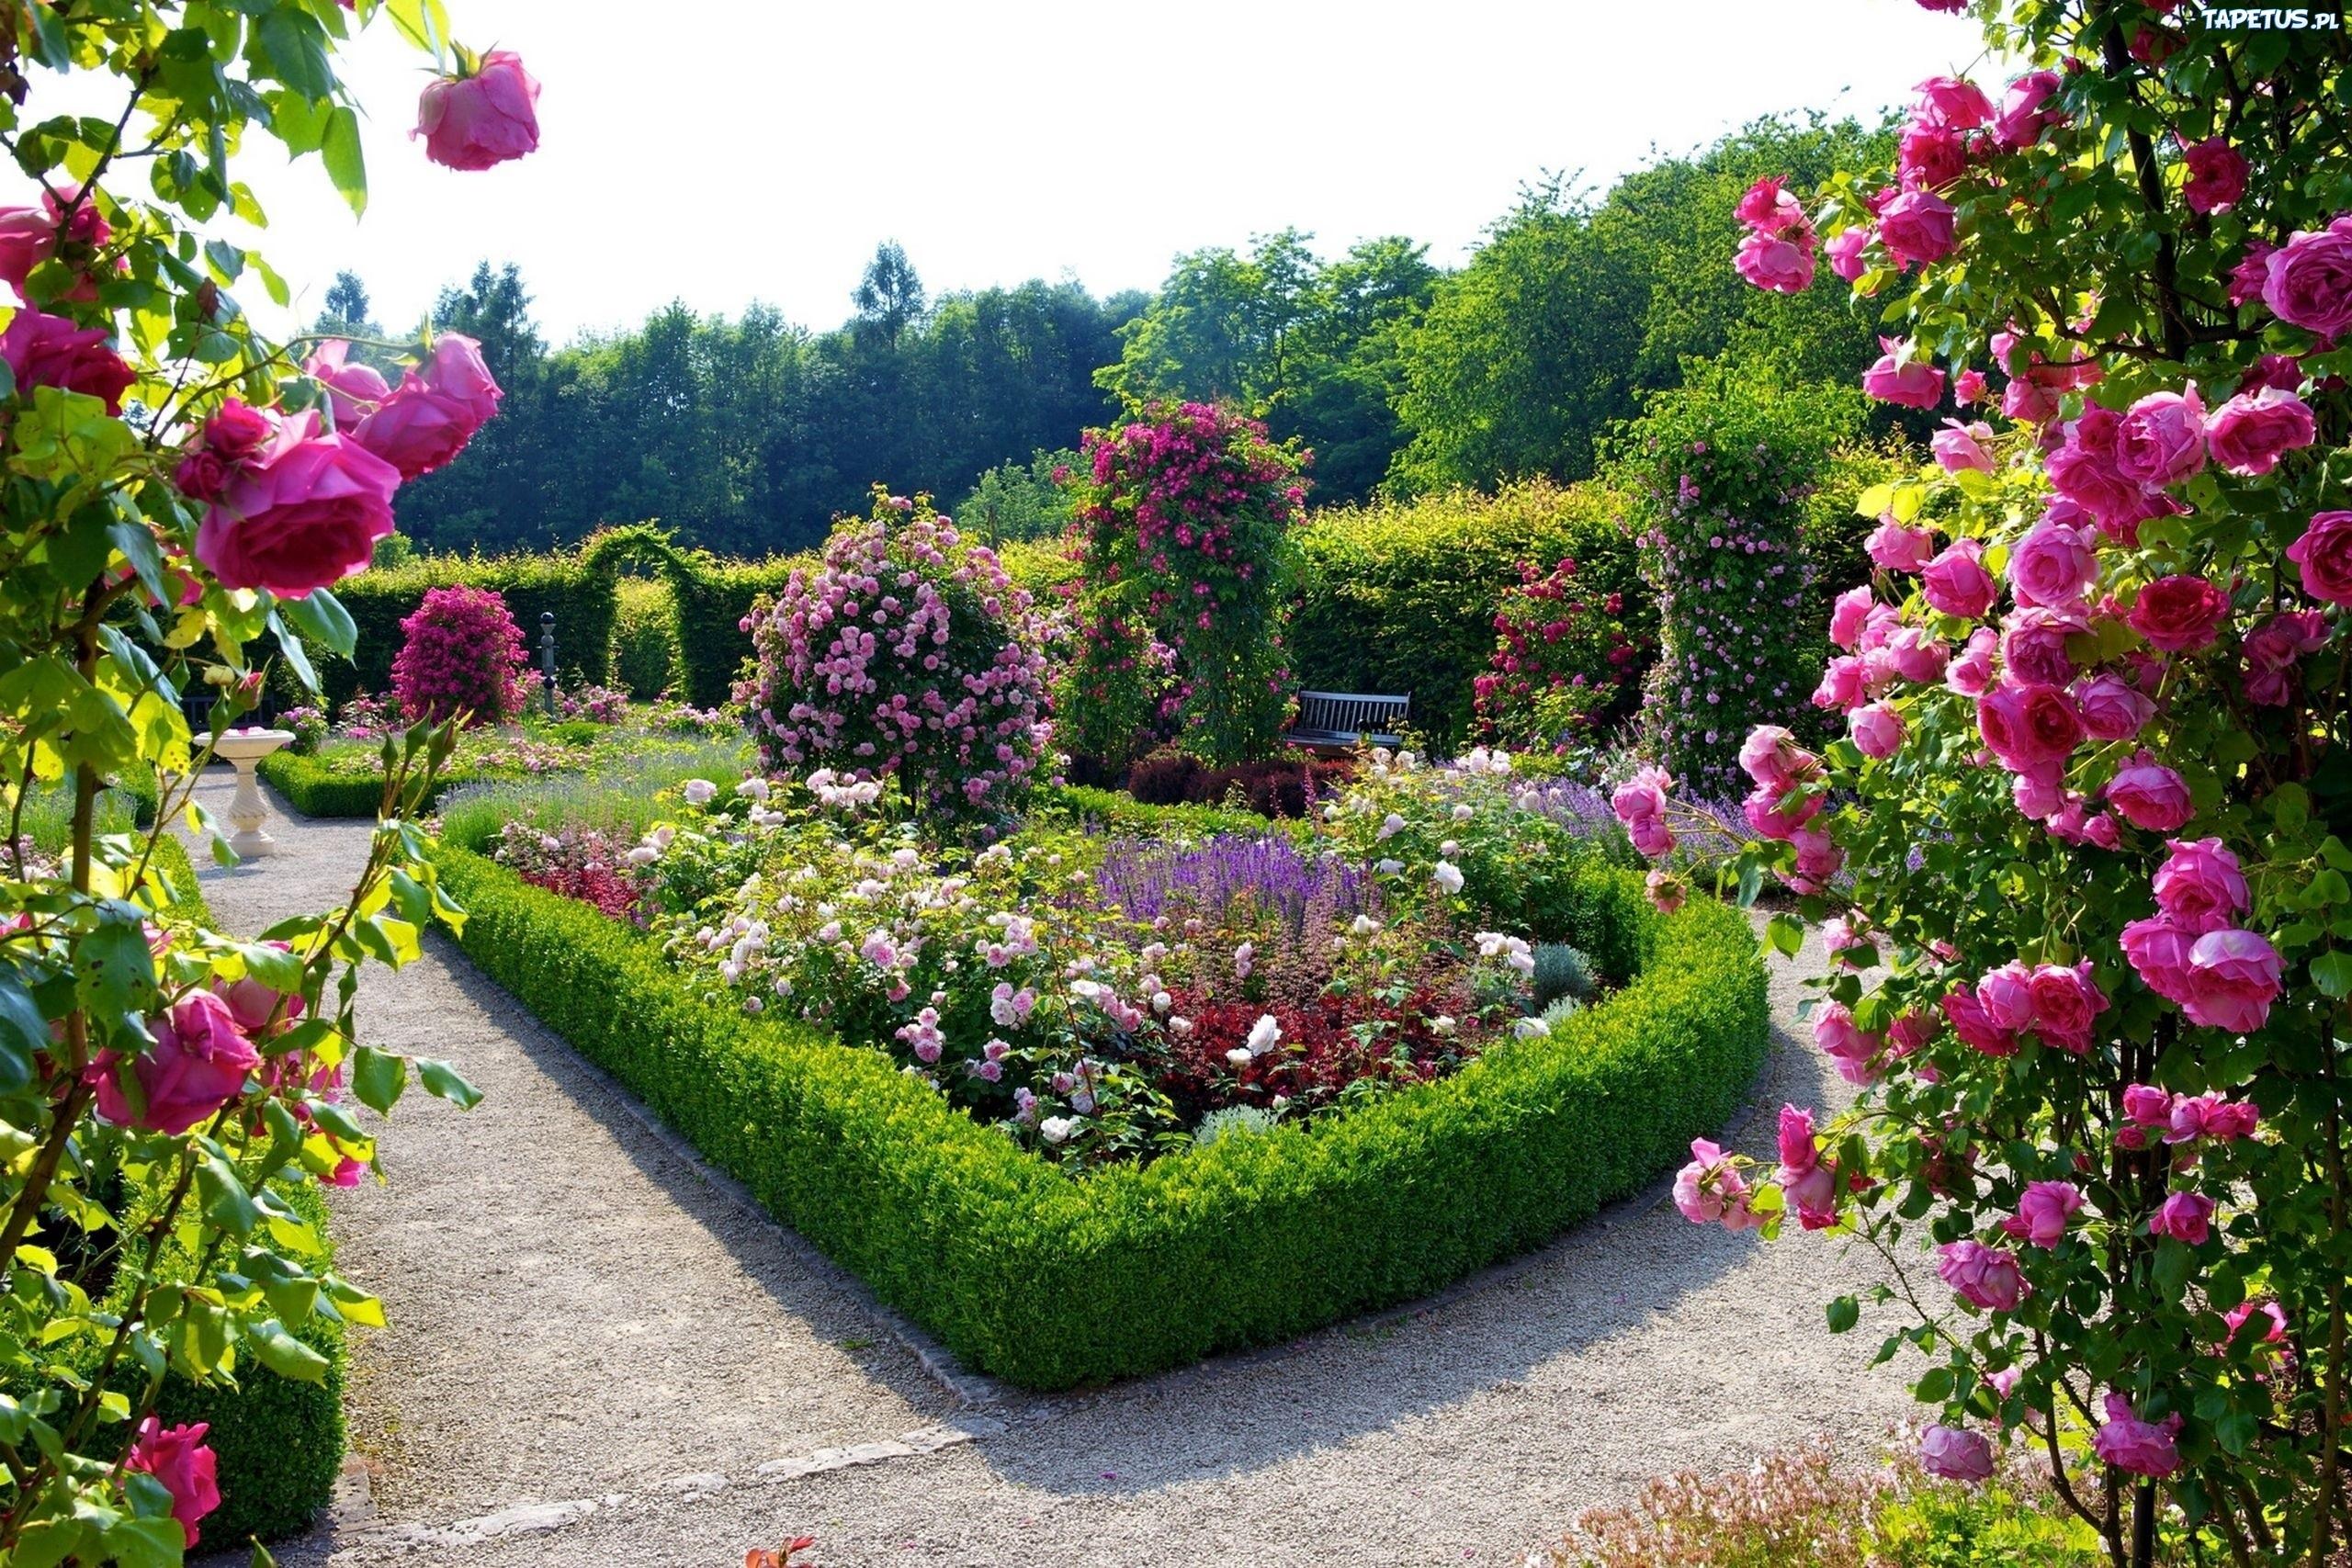 Pi kny ogr d r any for Garden design 1920 s